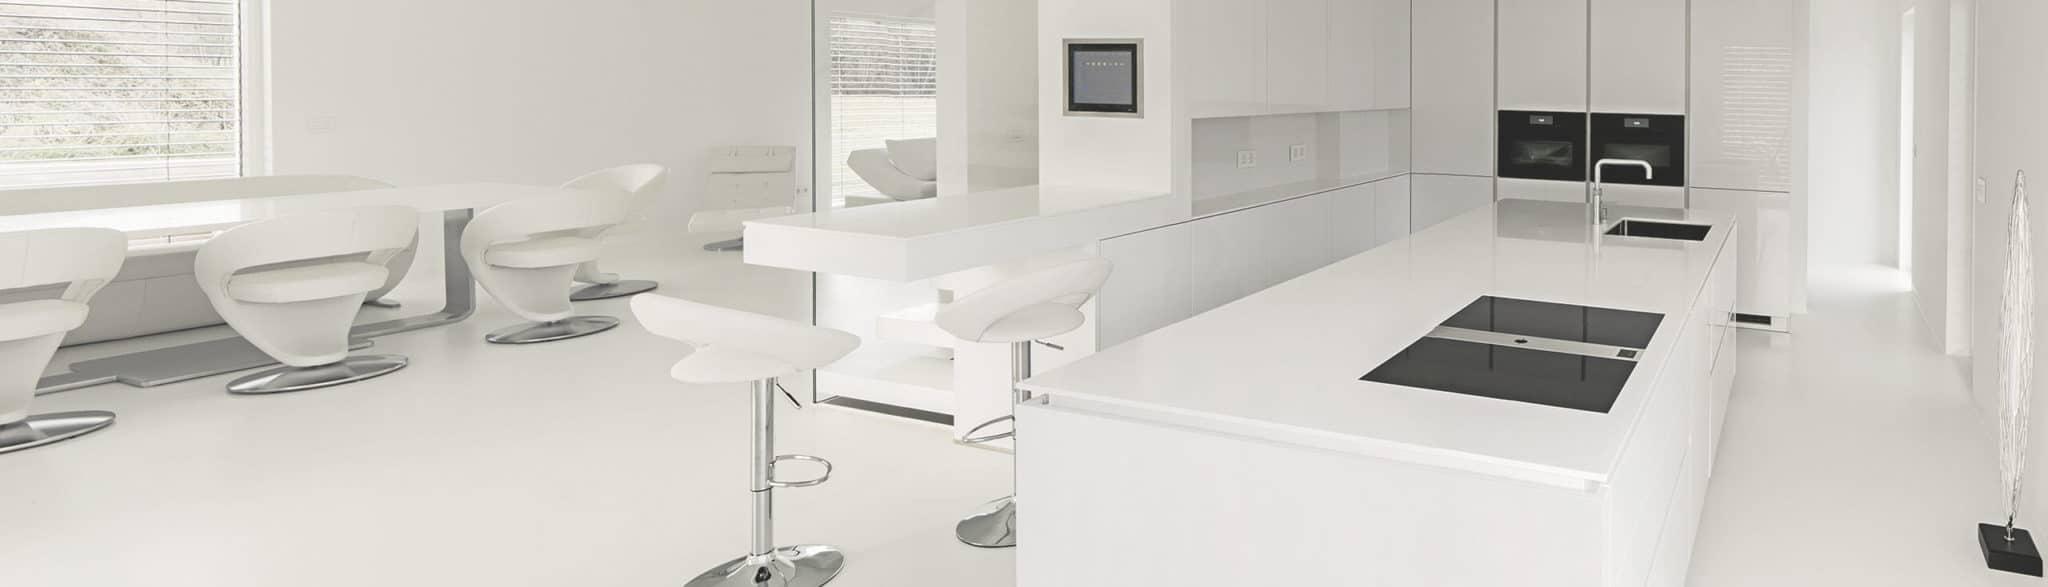 Cocina de dise o blanca muebles de cocina en madrid for Cocinas de diseno 2016